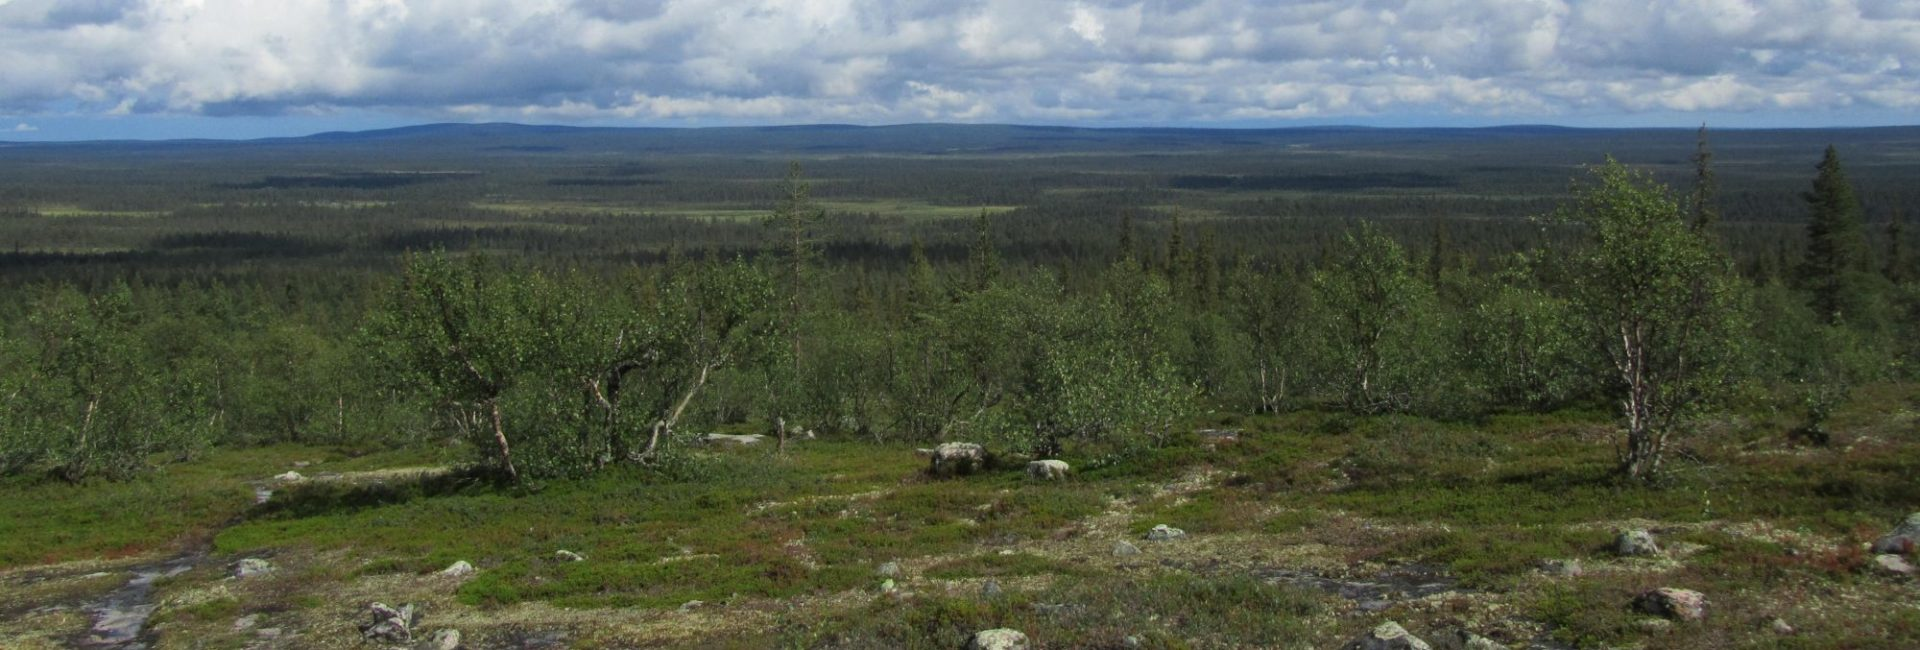 Pulju wilderness area